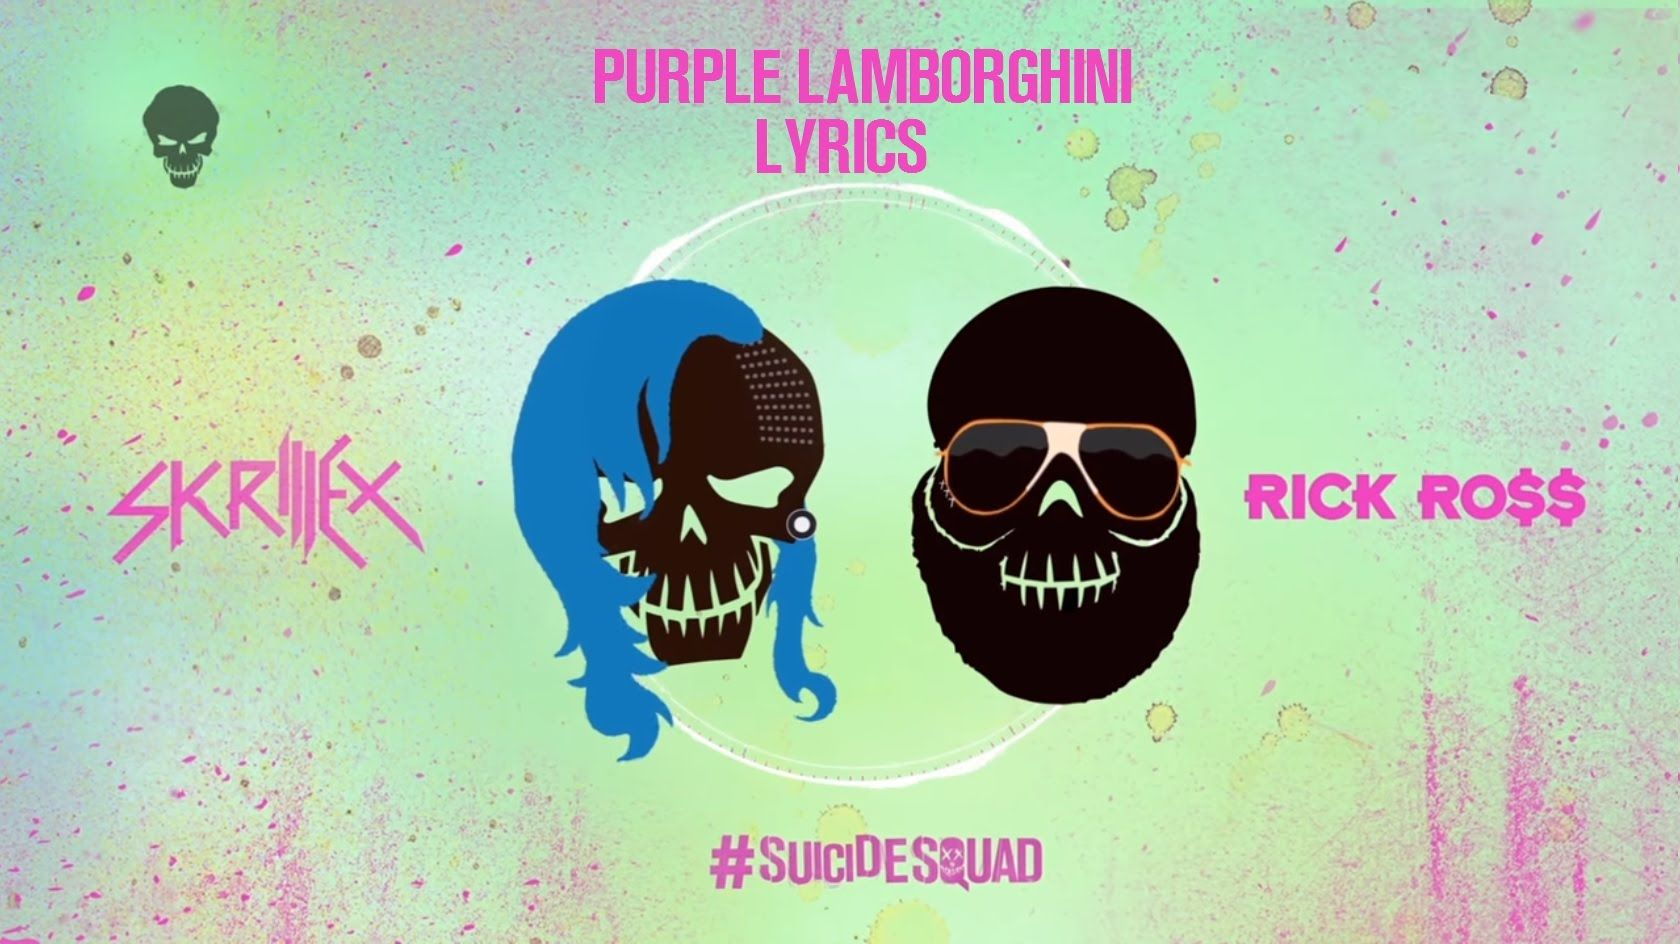 Skrillex Rick Ross Purple Lamborghini Lyrics Youtube Music